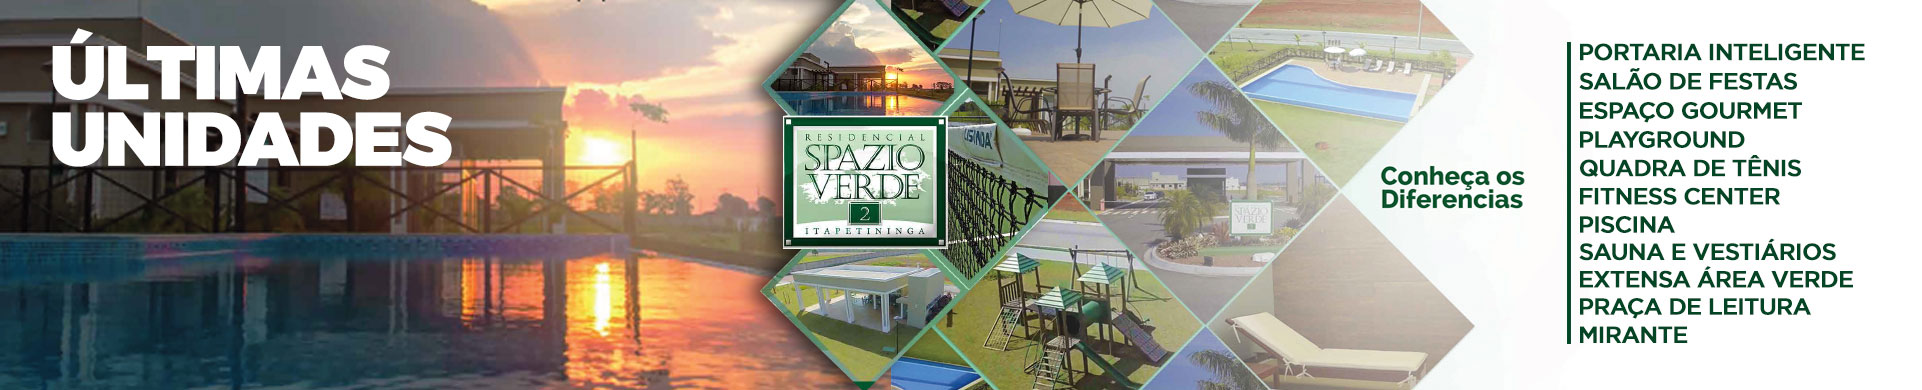 Spazio Verde 2